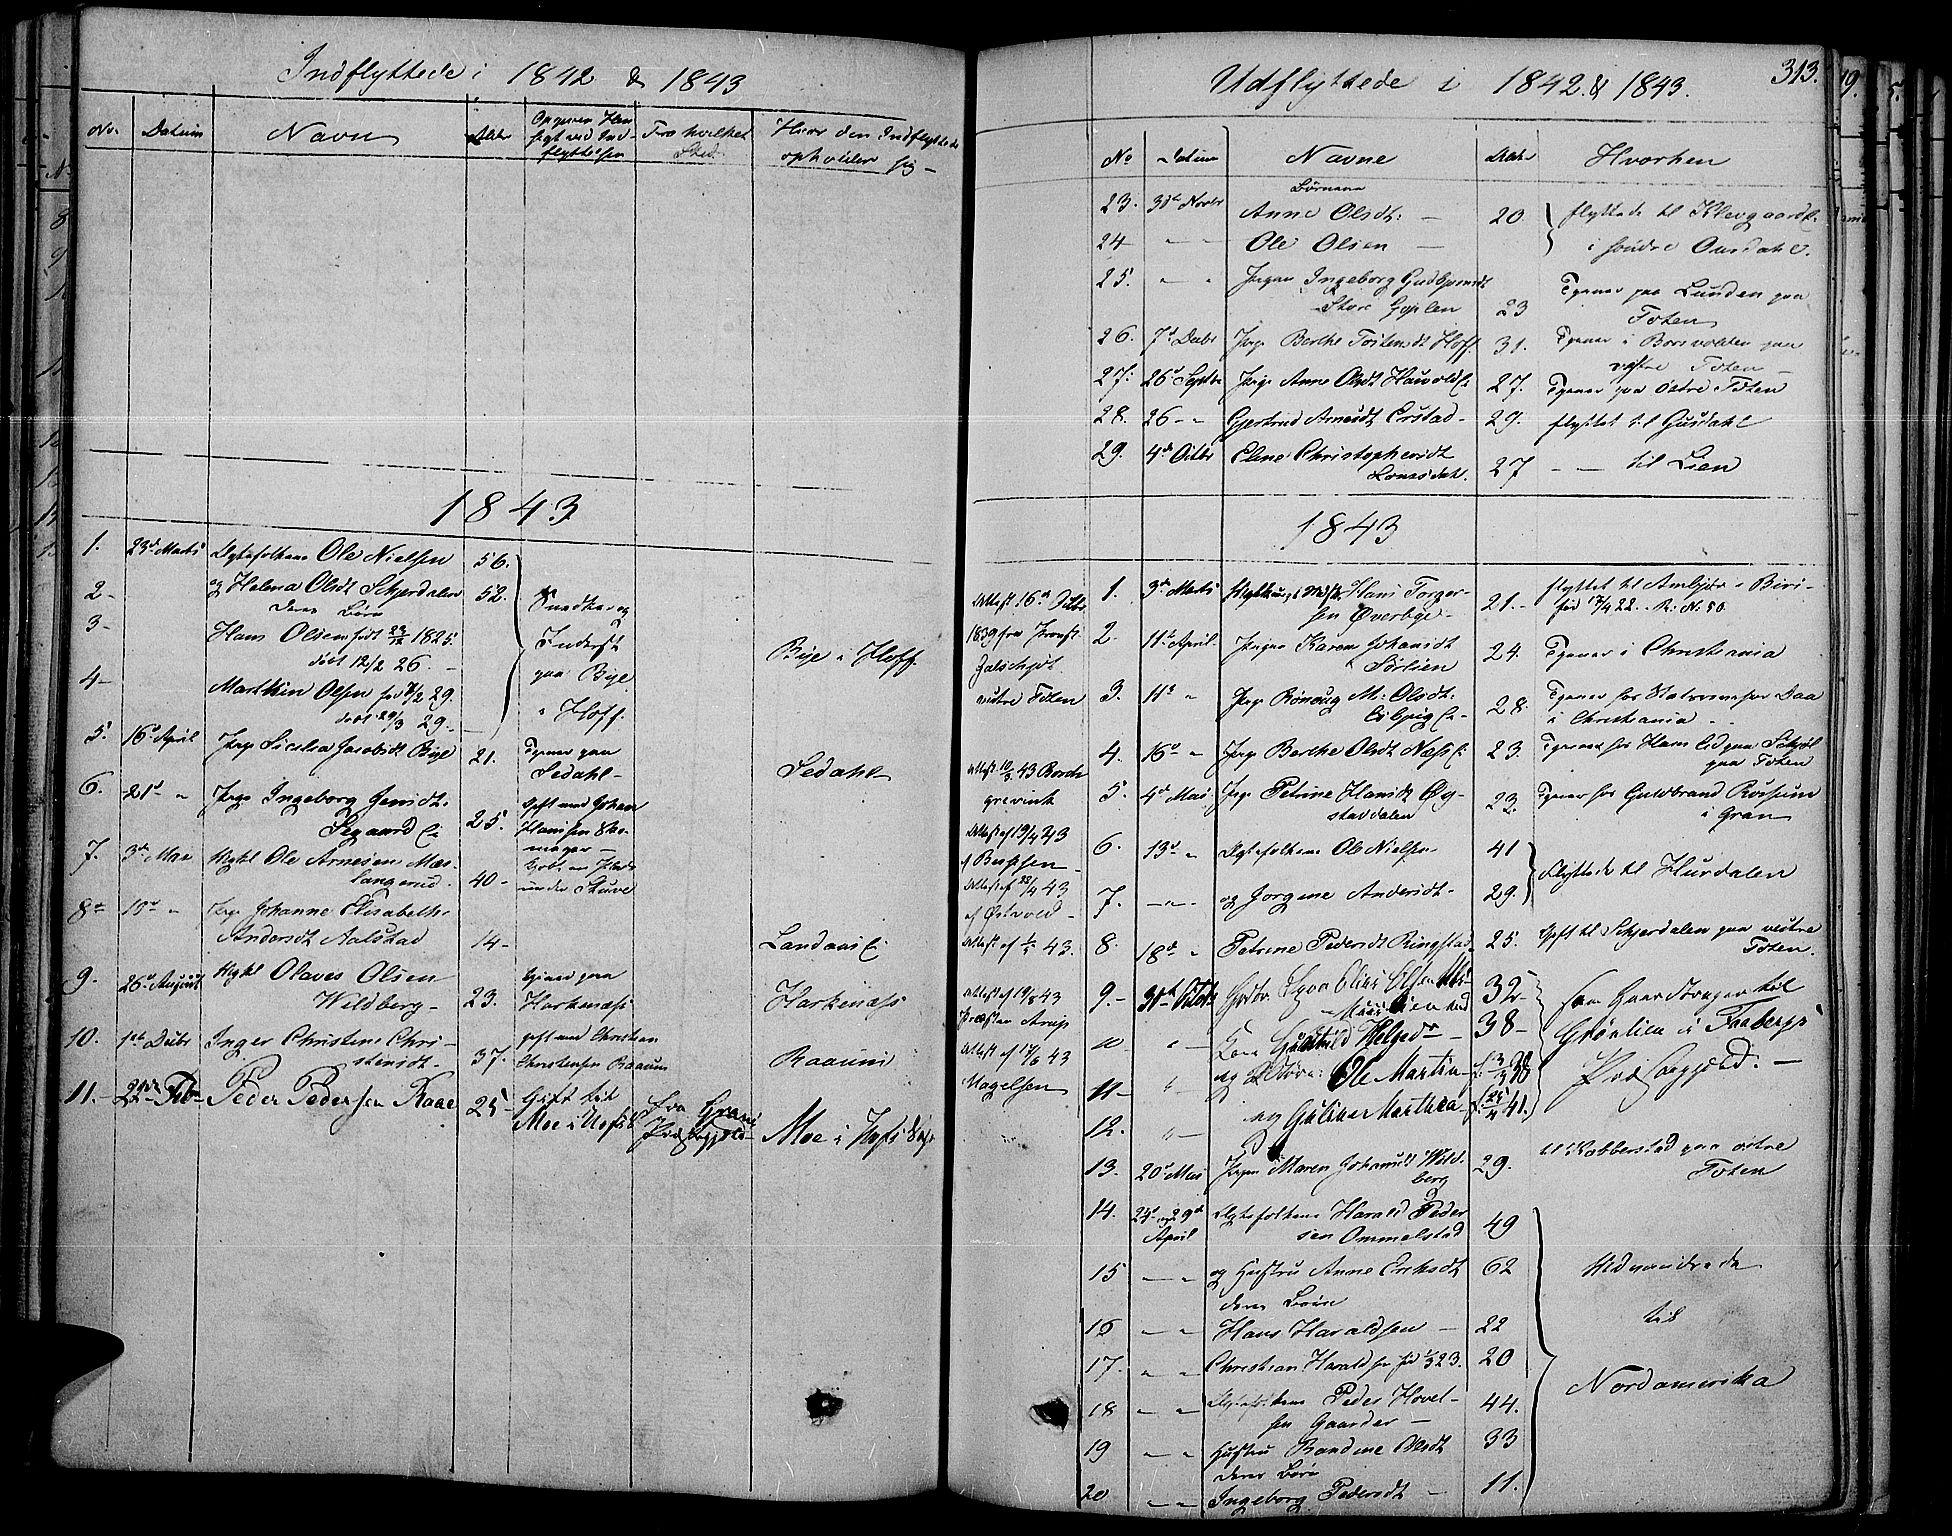 SAH, Land prestekontor, Ministerialbok nr. 8, 1830-1846, s. 313